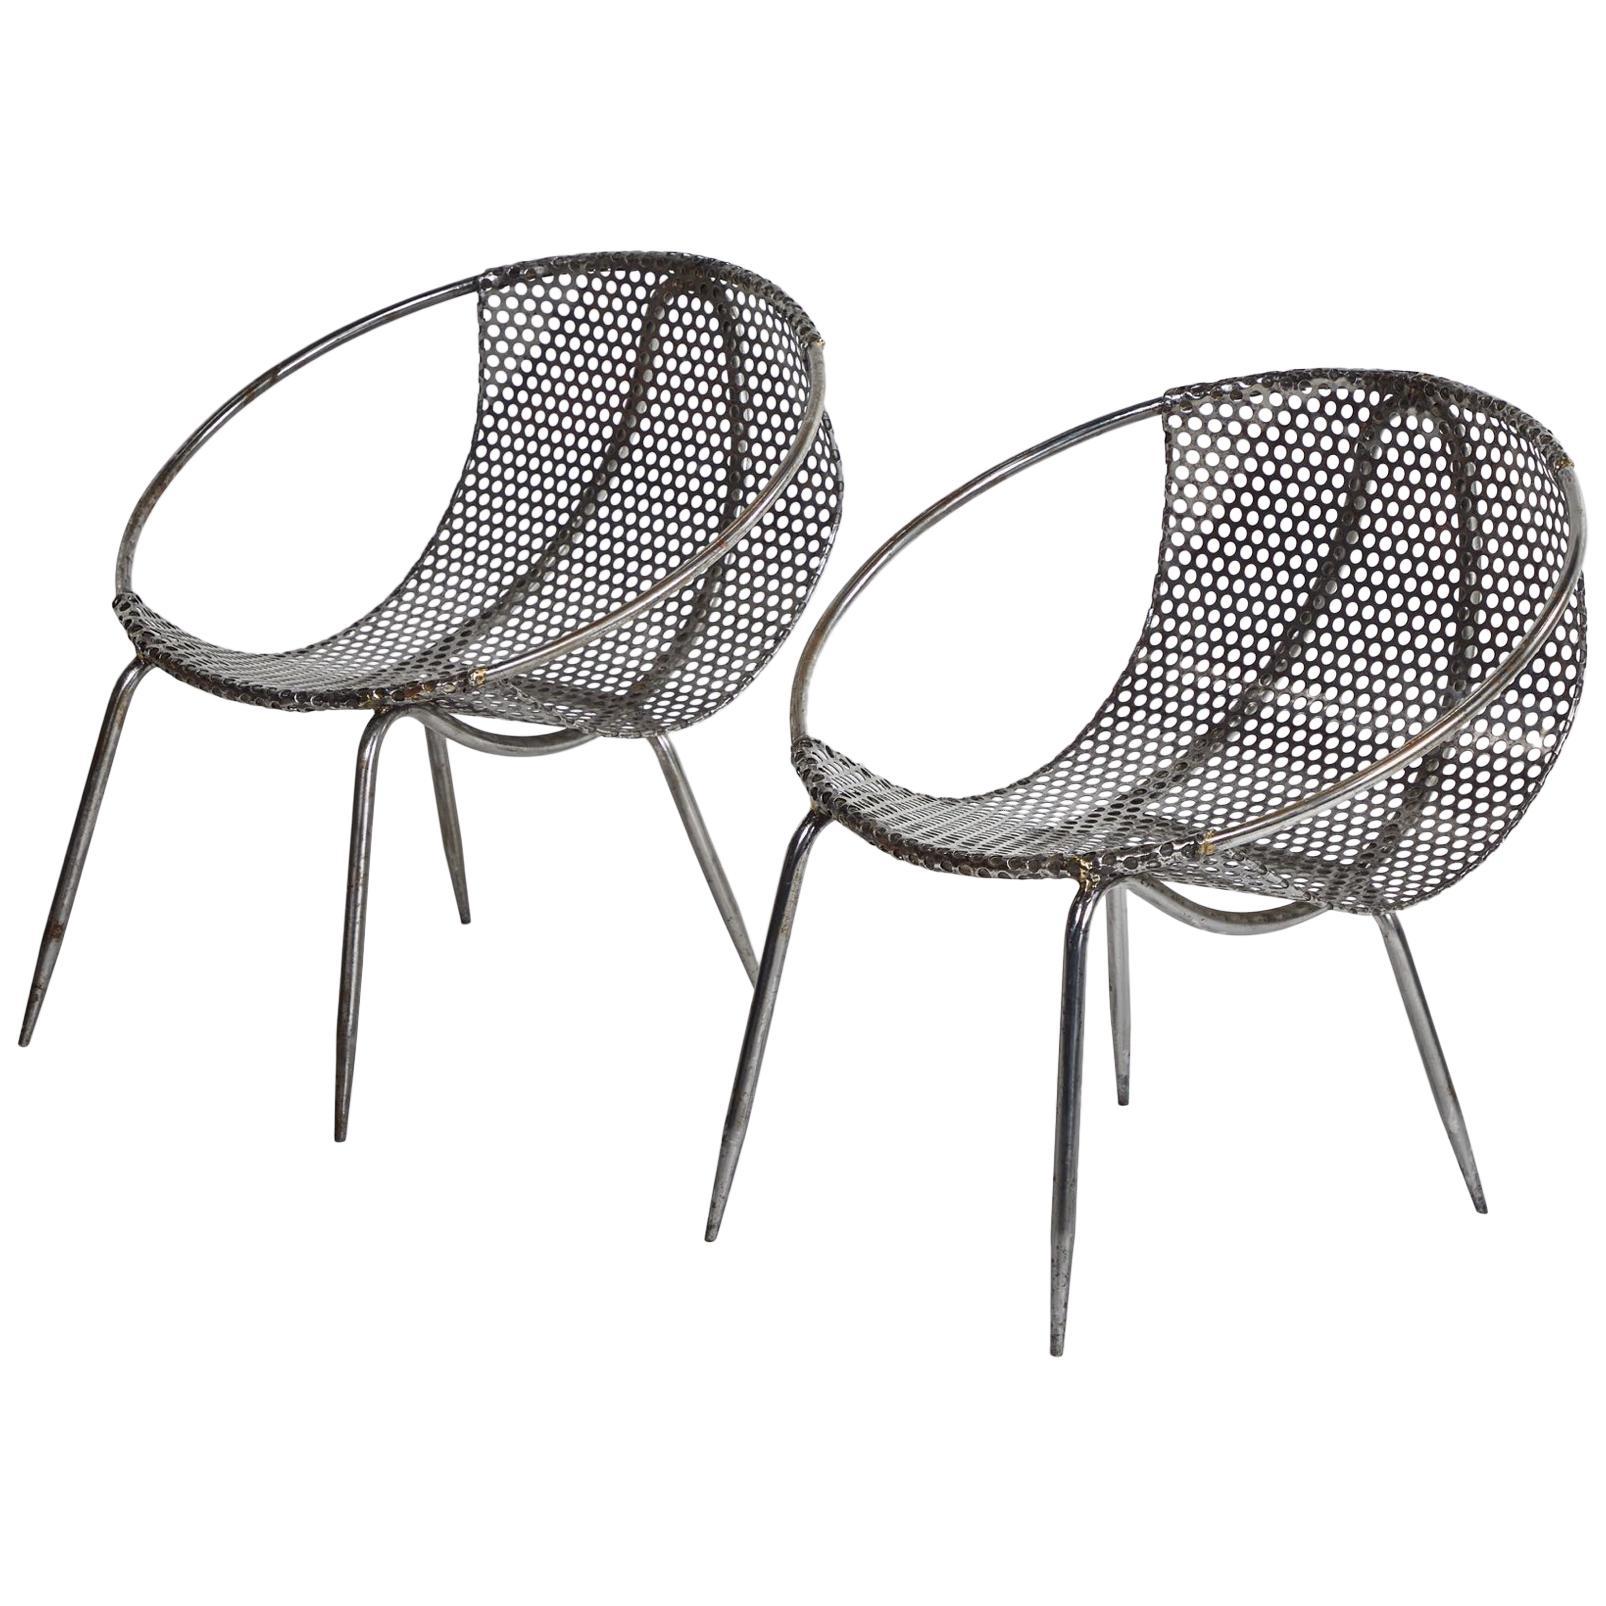 Etonnant Pair Of Metal Tub Chairs